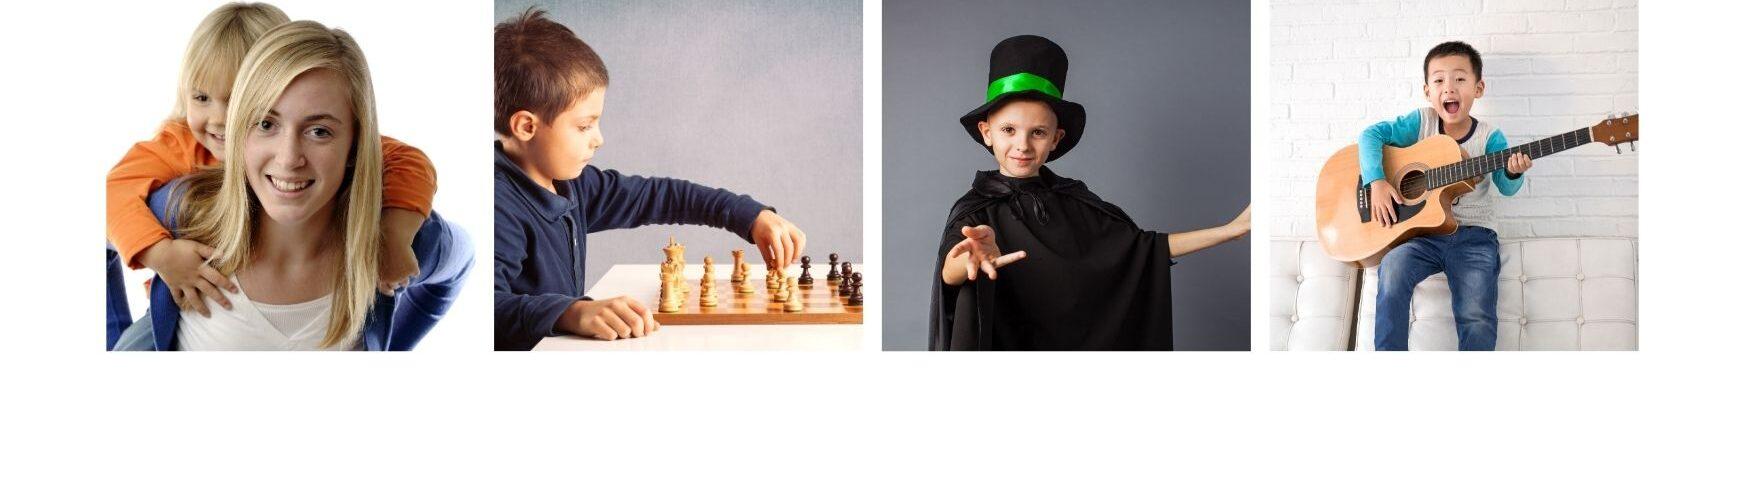 various youth programs (magic, guitar, chess)